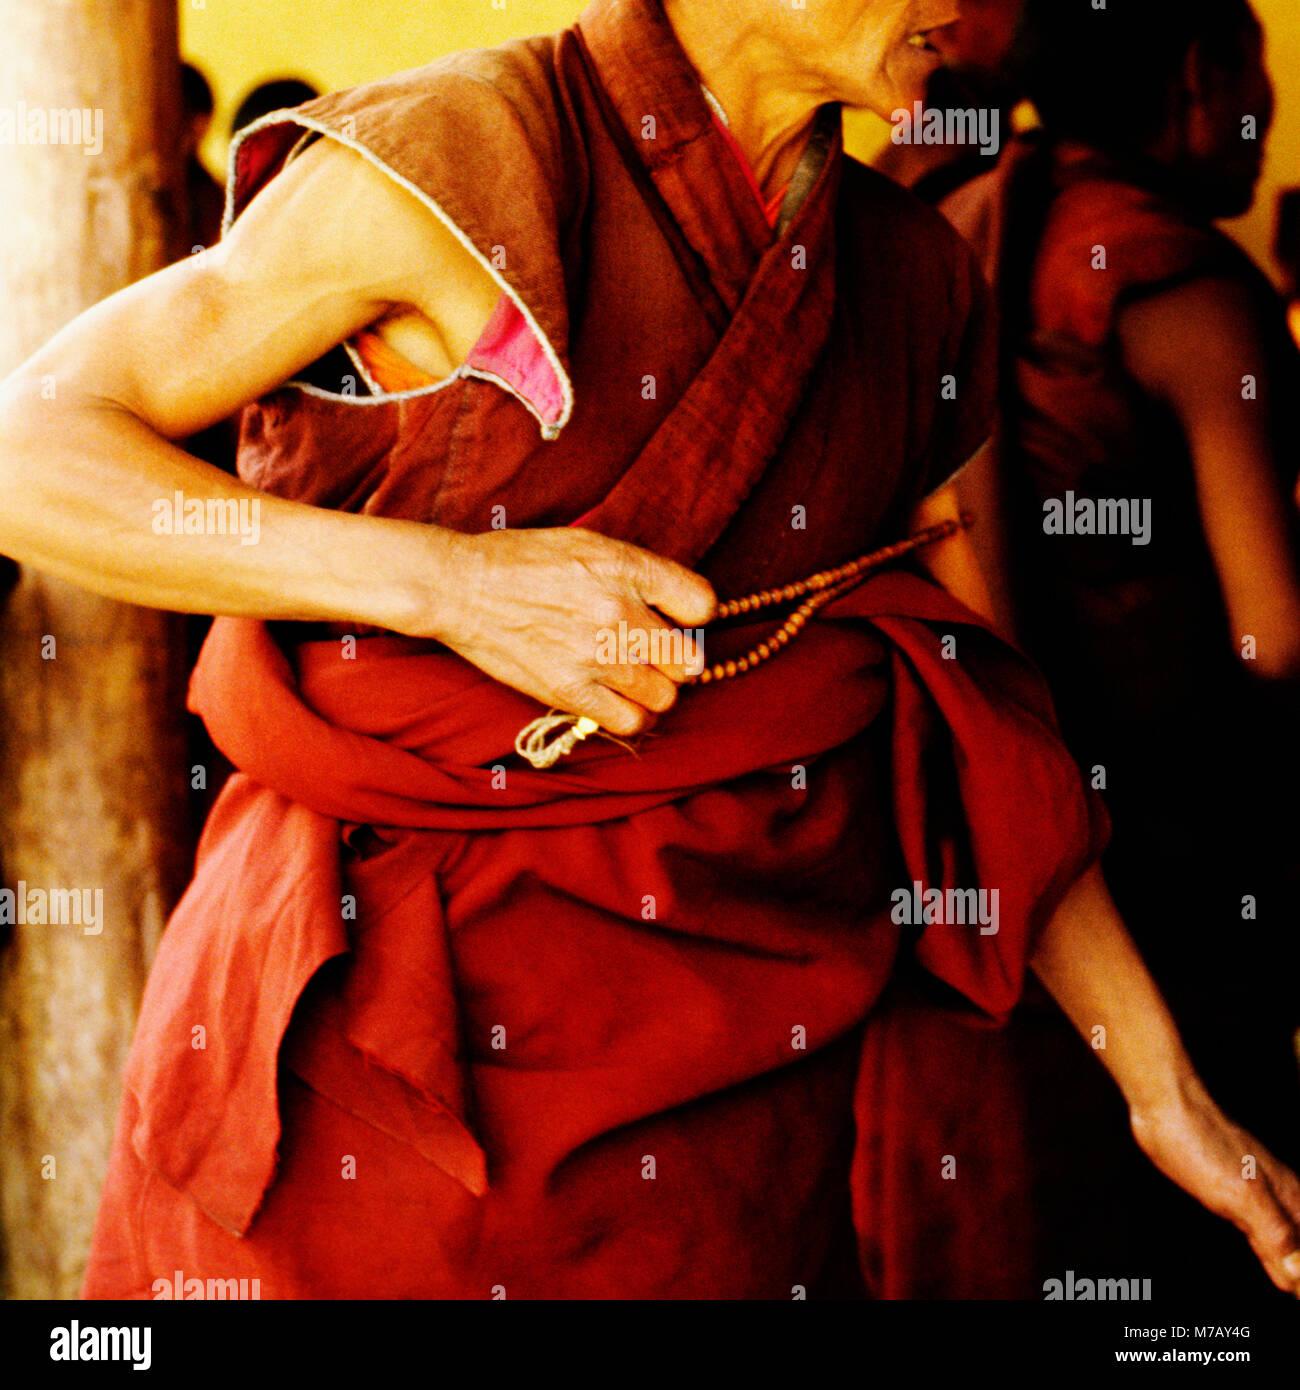 Mid section view of a monk holding prayer beads, Shigatse, Tibet, China - Stock Image